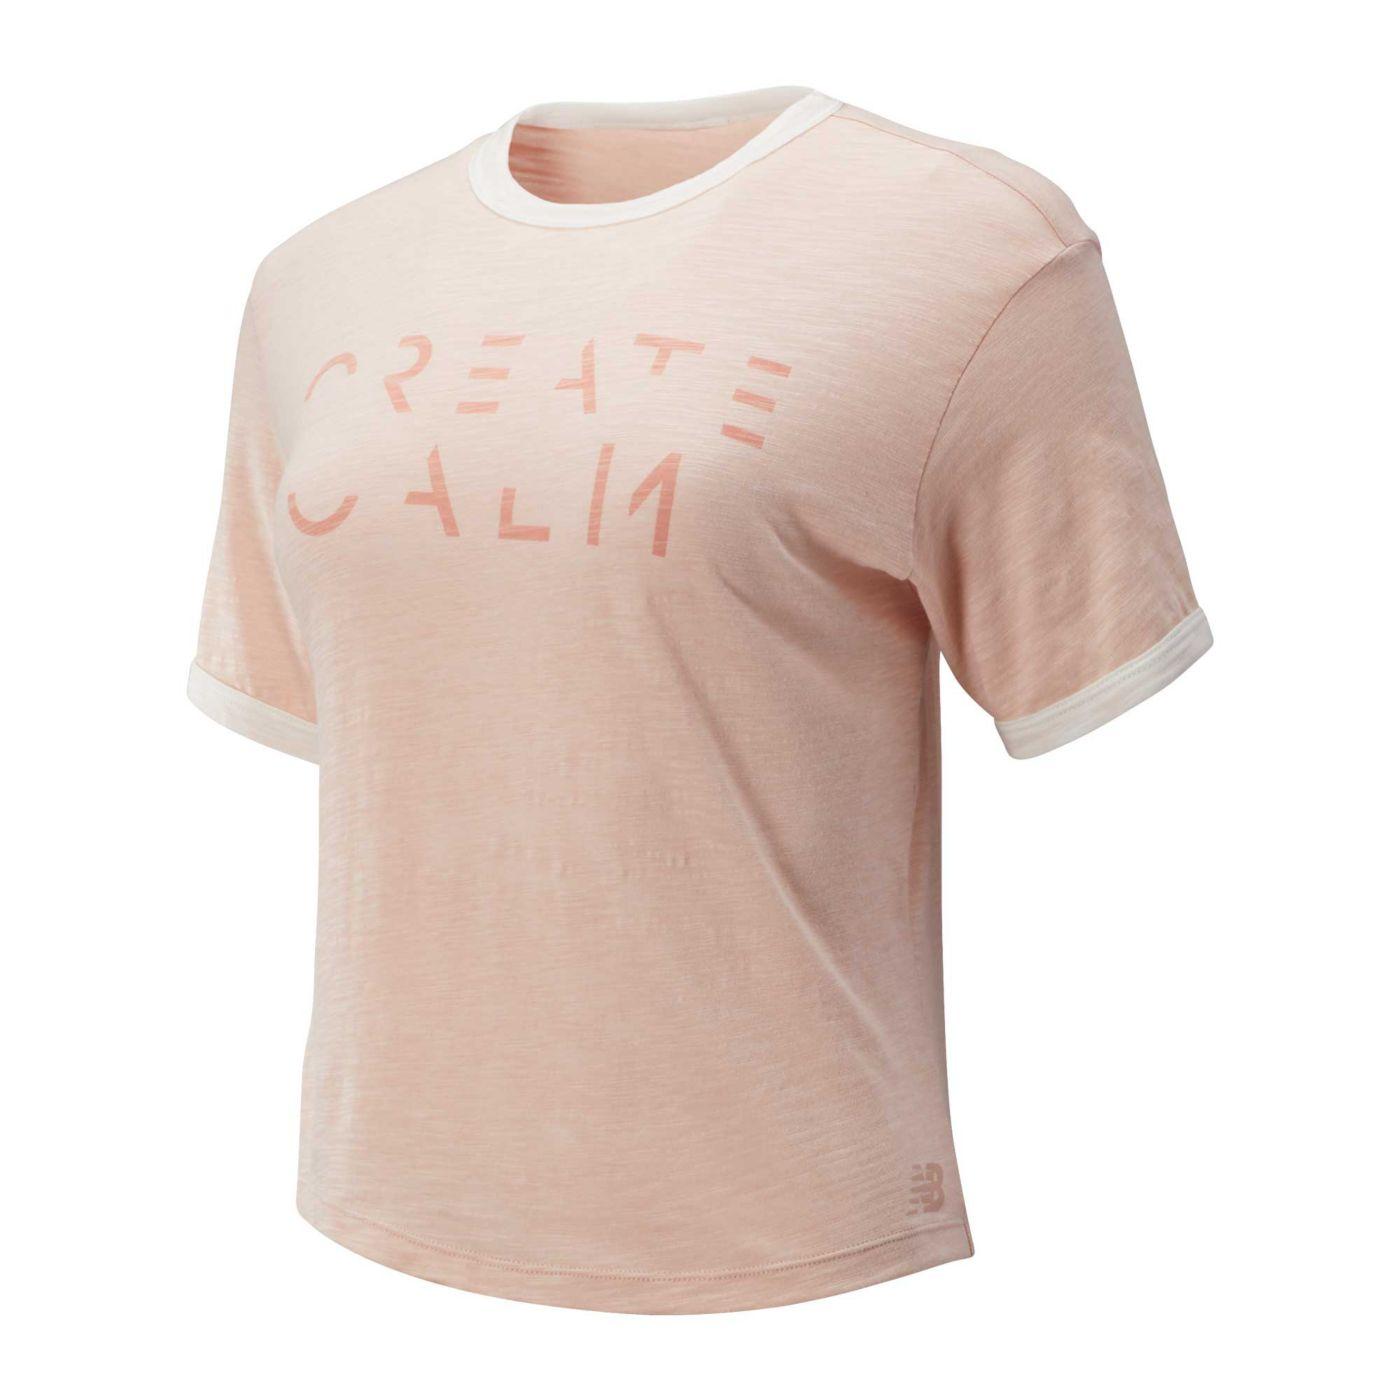 New Balance Women's Evolve Cropped T-Shirt